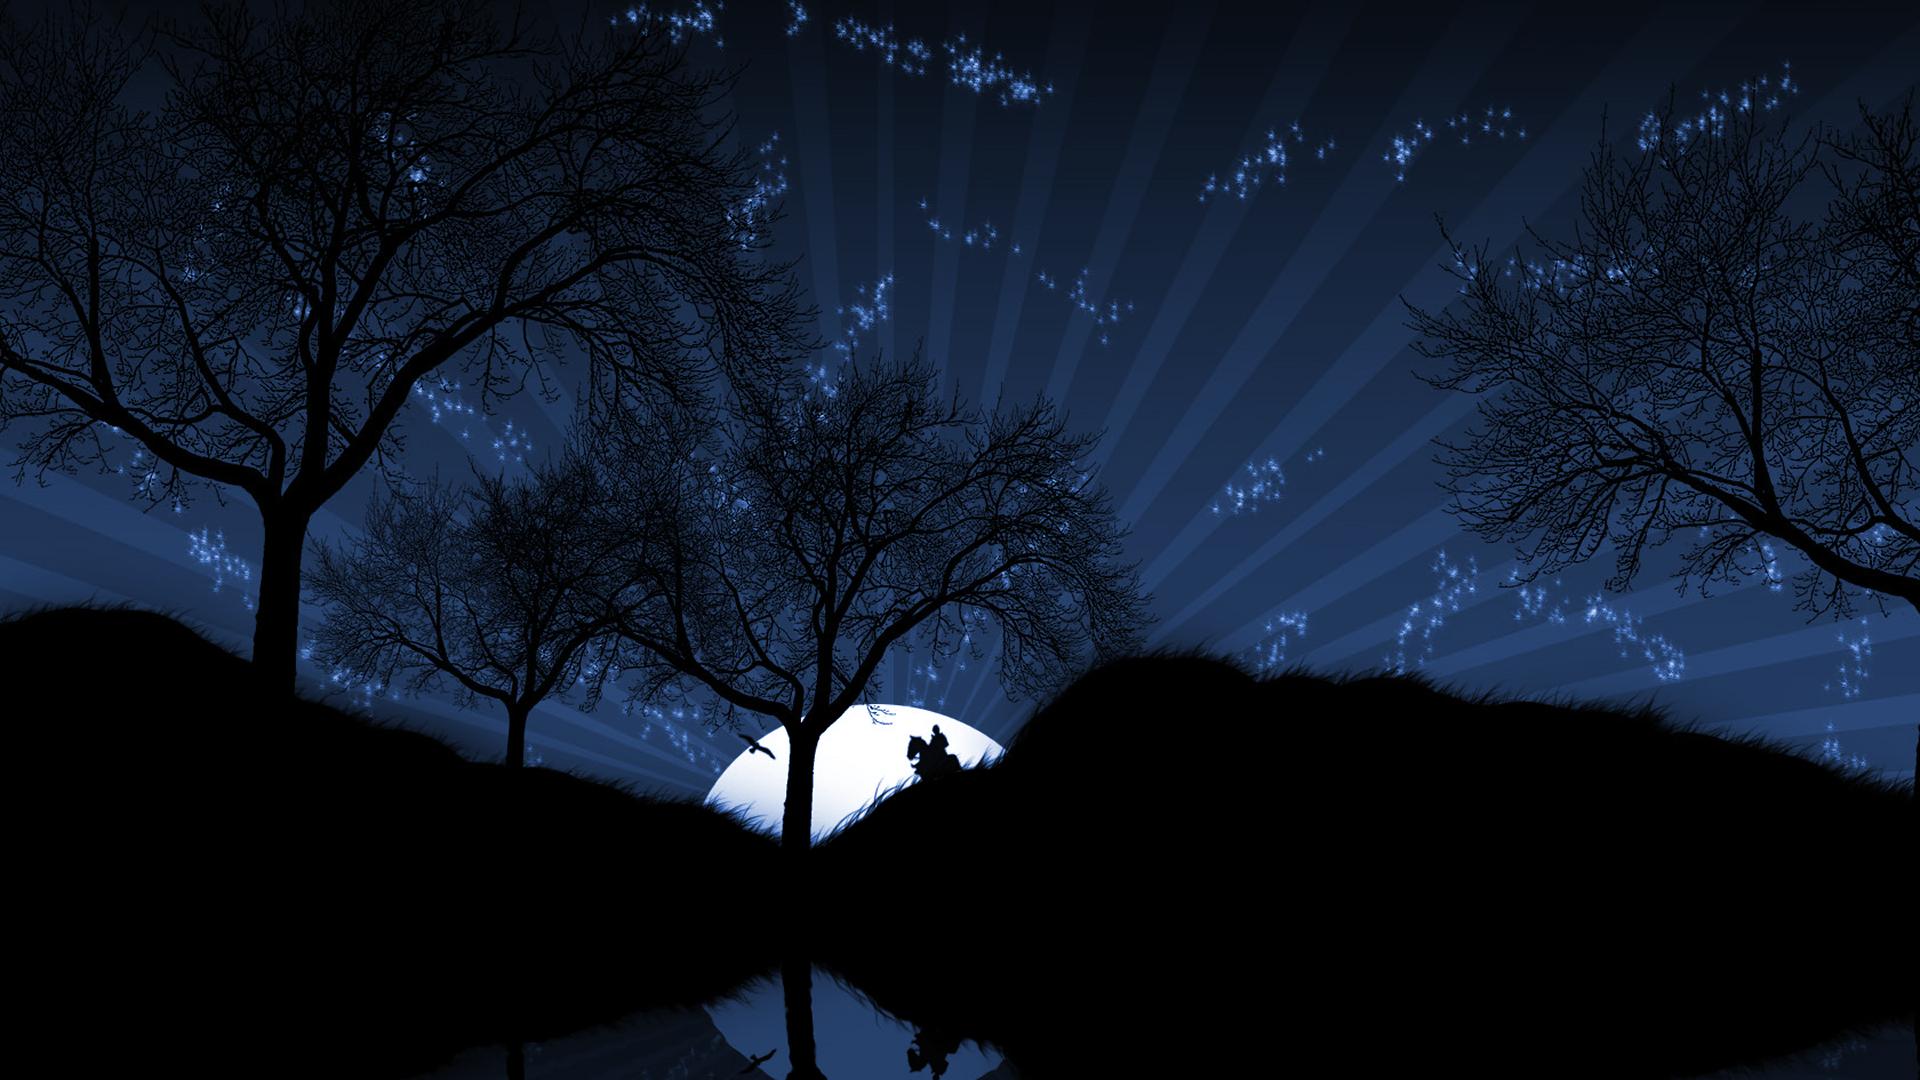 Wallpaper download good night - Good Night Good Night Creativity Wallpaper Of Good Night Latest Hd Wallpaper